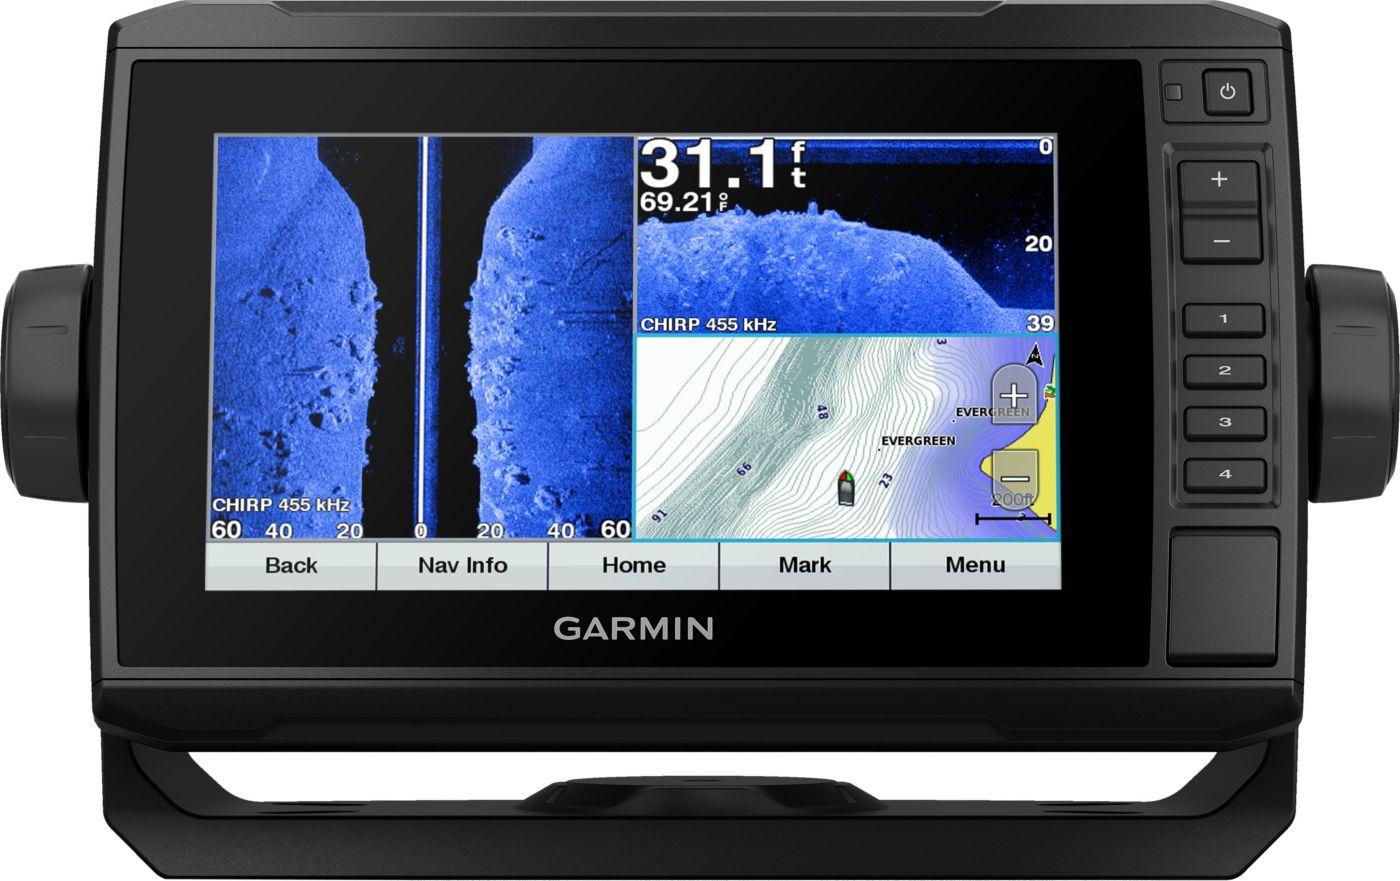 Garmin echoMAP Plus 73sv Lakevu G3 GPS Fish Finder (010-01897-05)